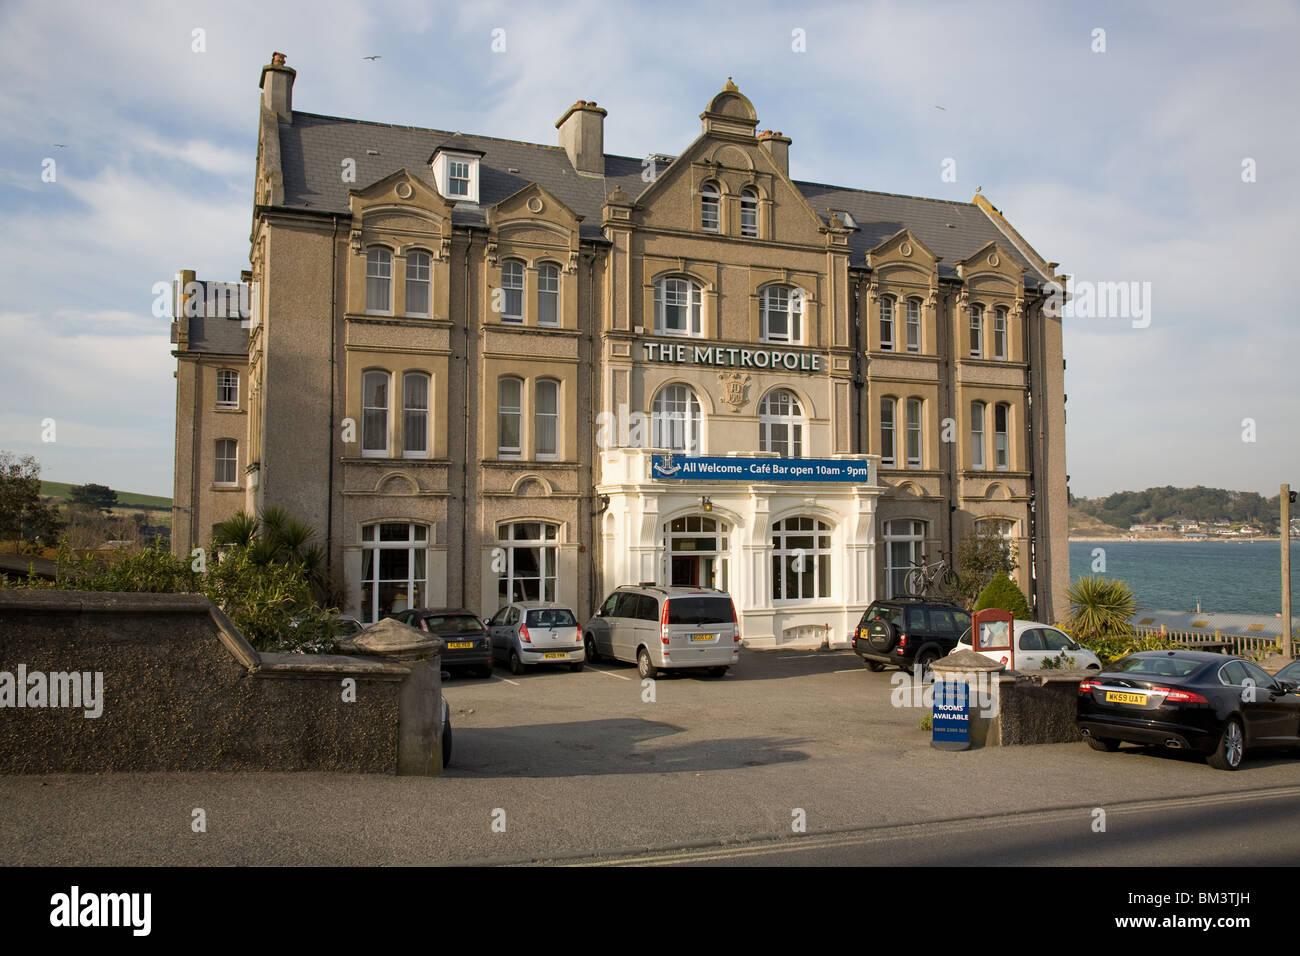 Das Metropole Hotel in Padstow, Cornwall, England Stockbild